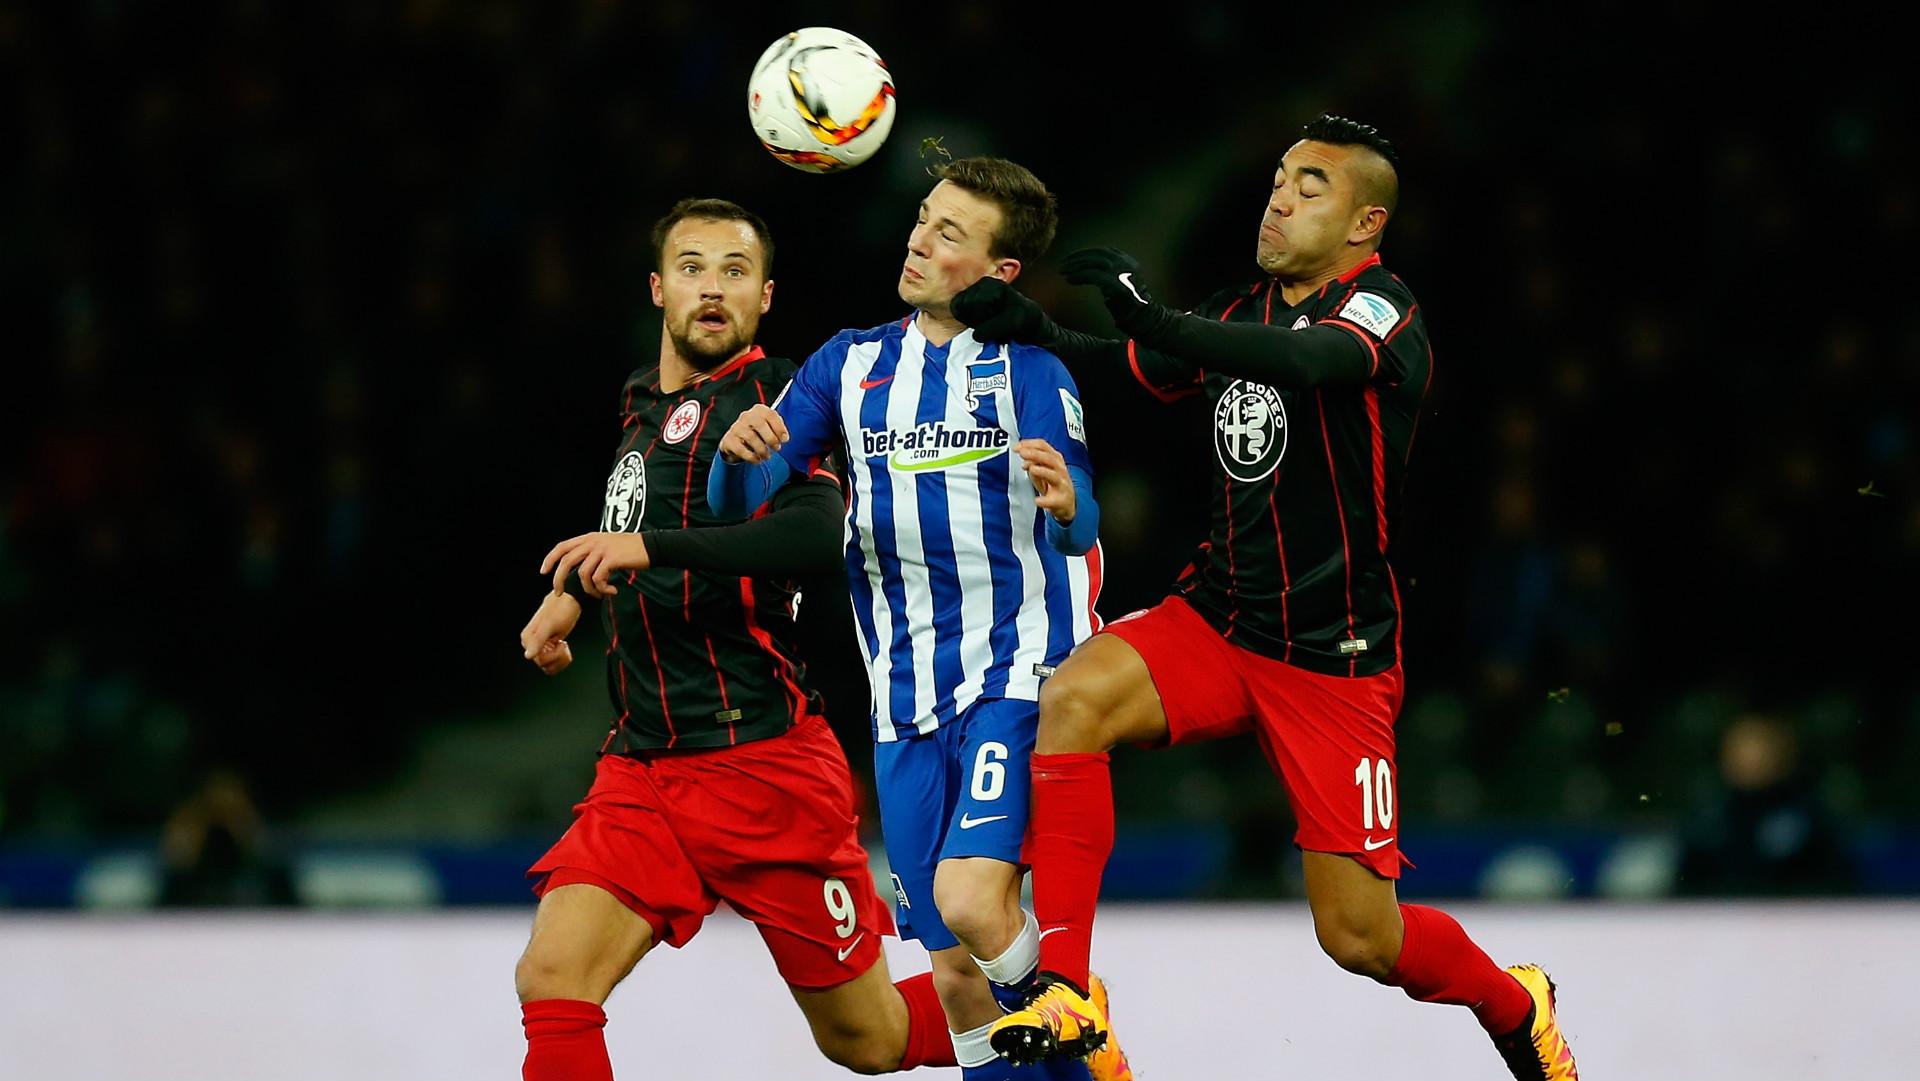 Image Result For En Vivo Hoffenheim Vs Eintracht Frankfurt En Vivo Uefa Champions